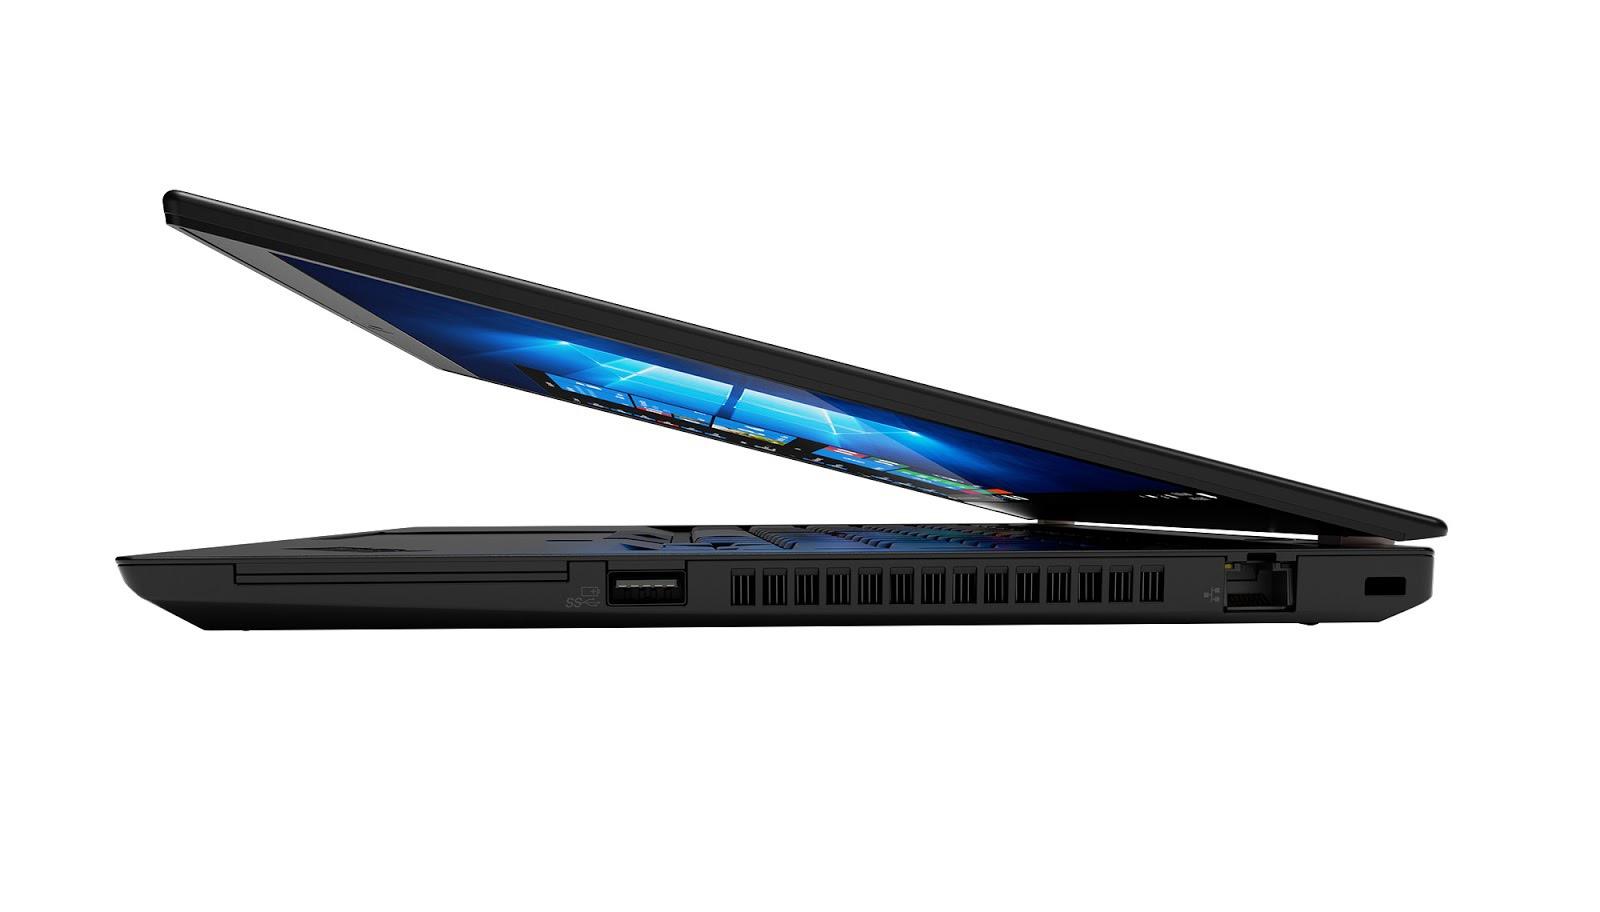 Фото 1. Ноутбук Lenovo ThinkPad T14 Gen 1 Black (20S00004RT)